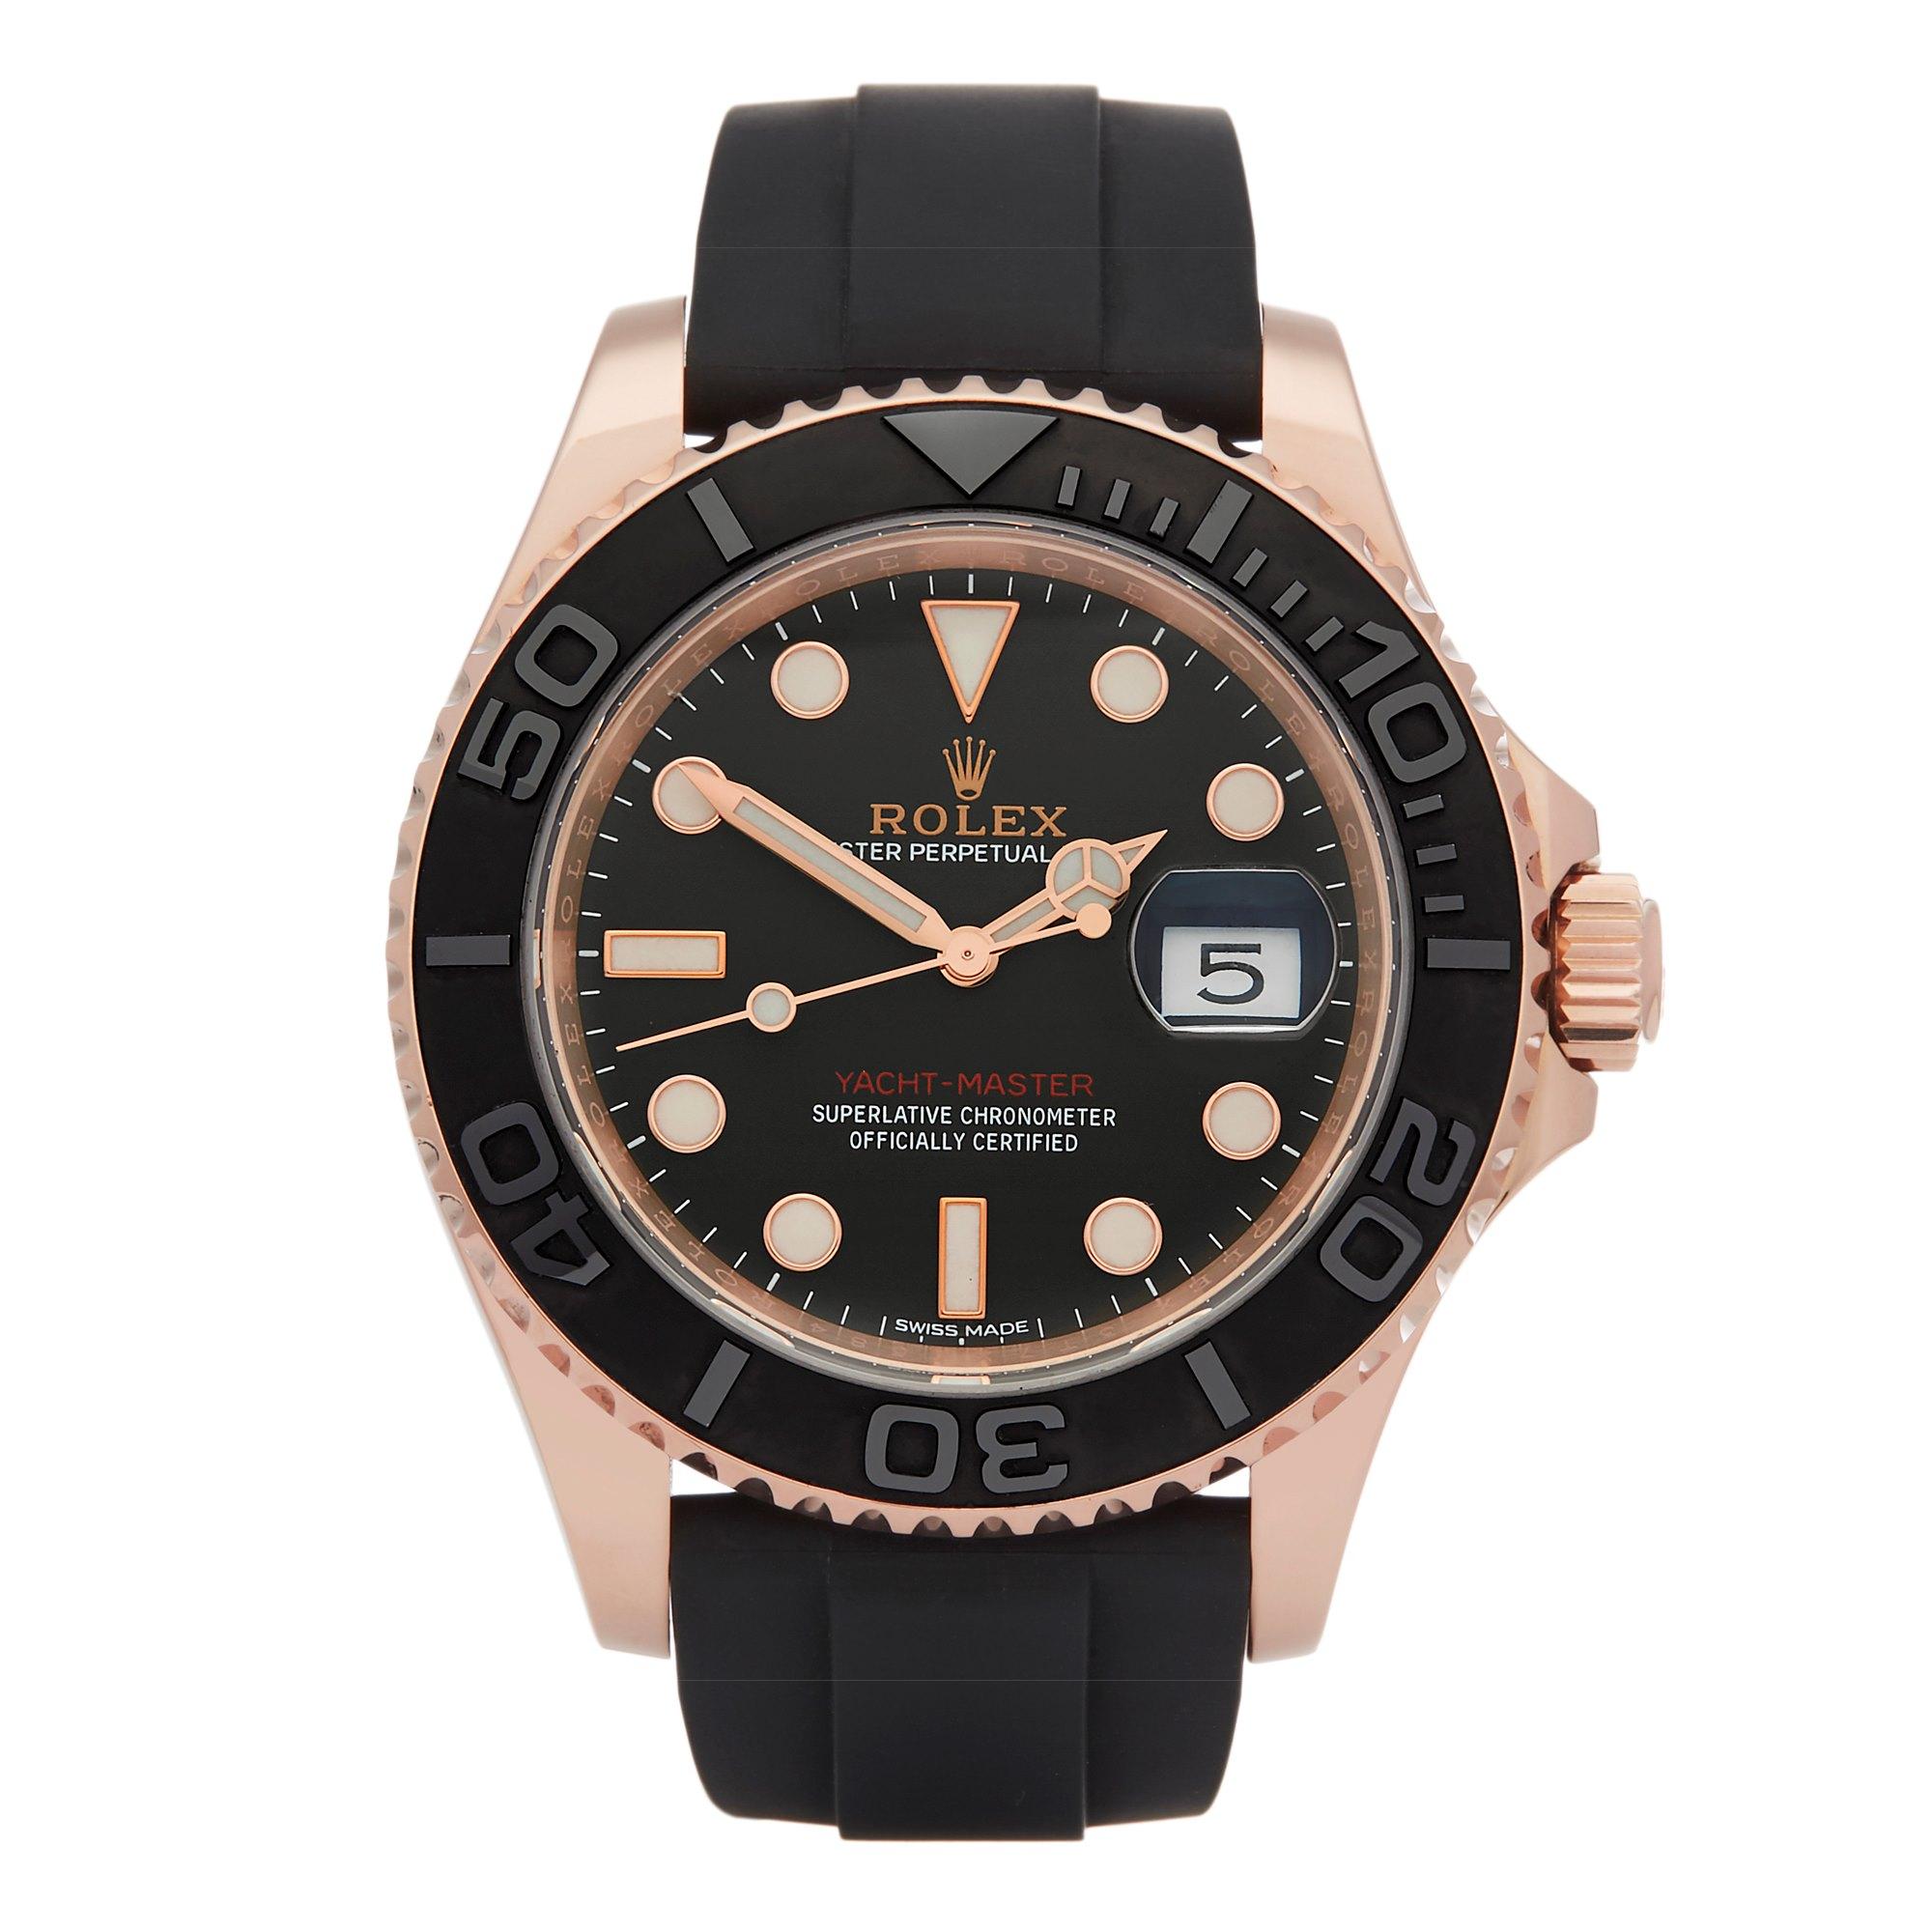 Rolex Yacht-Master 18k Rose Gold 116655